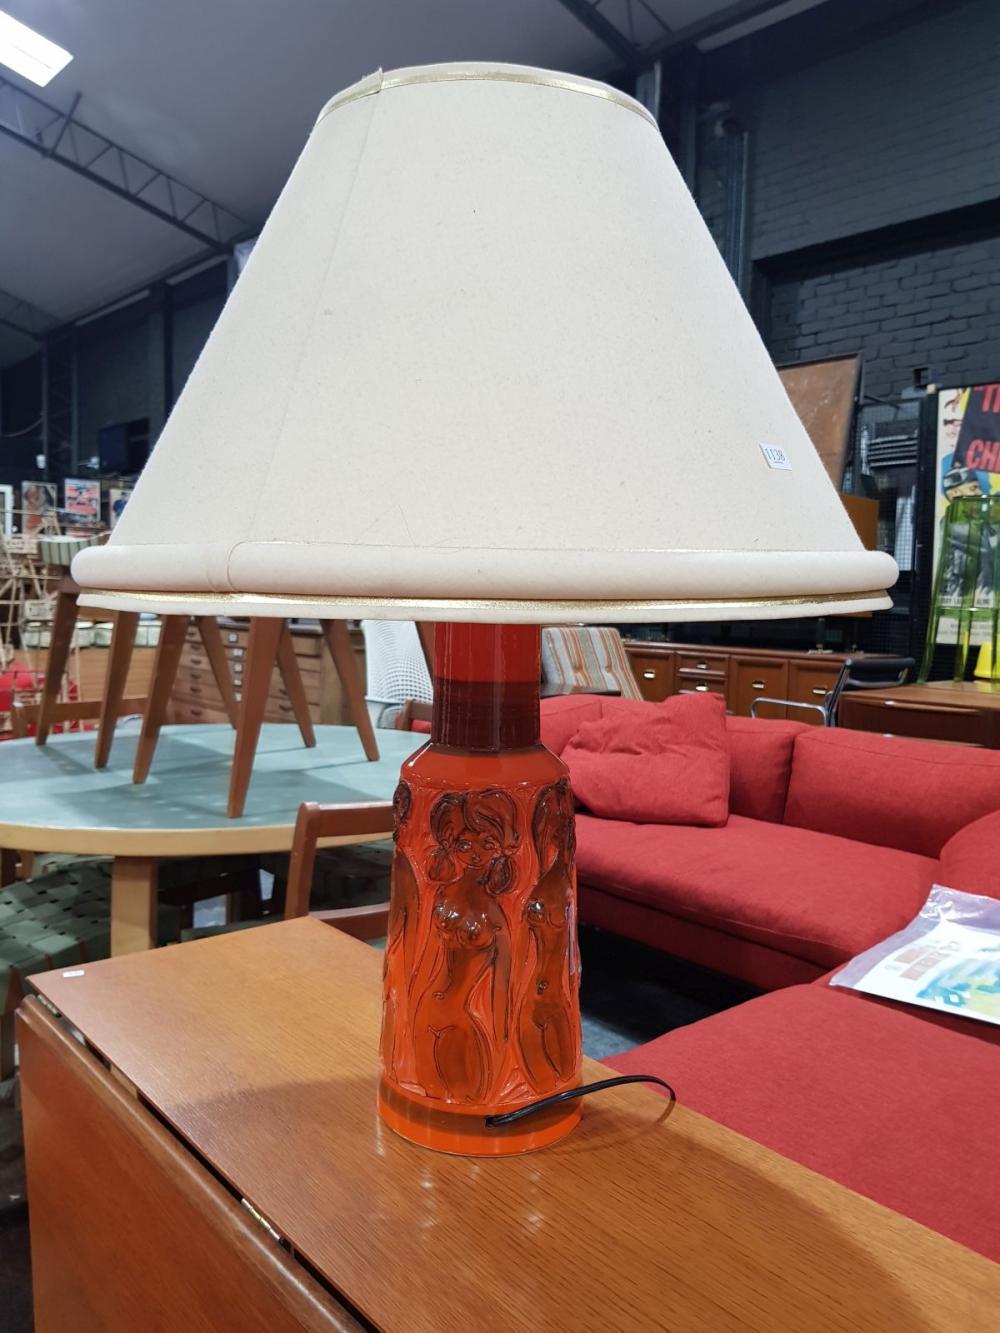 Italian Ceramic Glazed Table Lamp